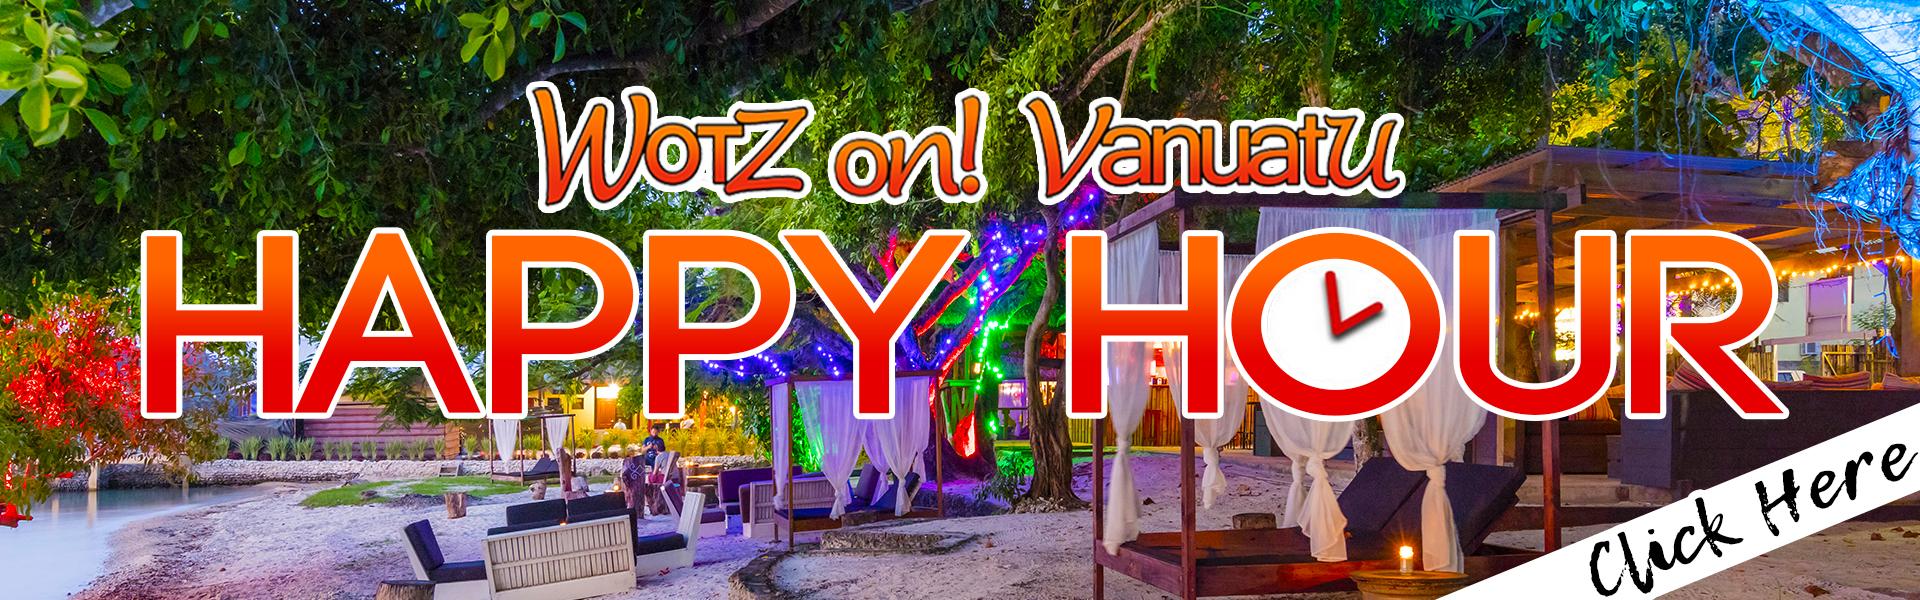 https://wotzonvanuatu.com/wp-content/uploads/2018/03/Wotz-on-Happy-Hour-1.jpg